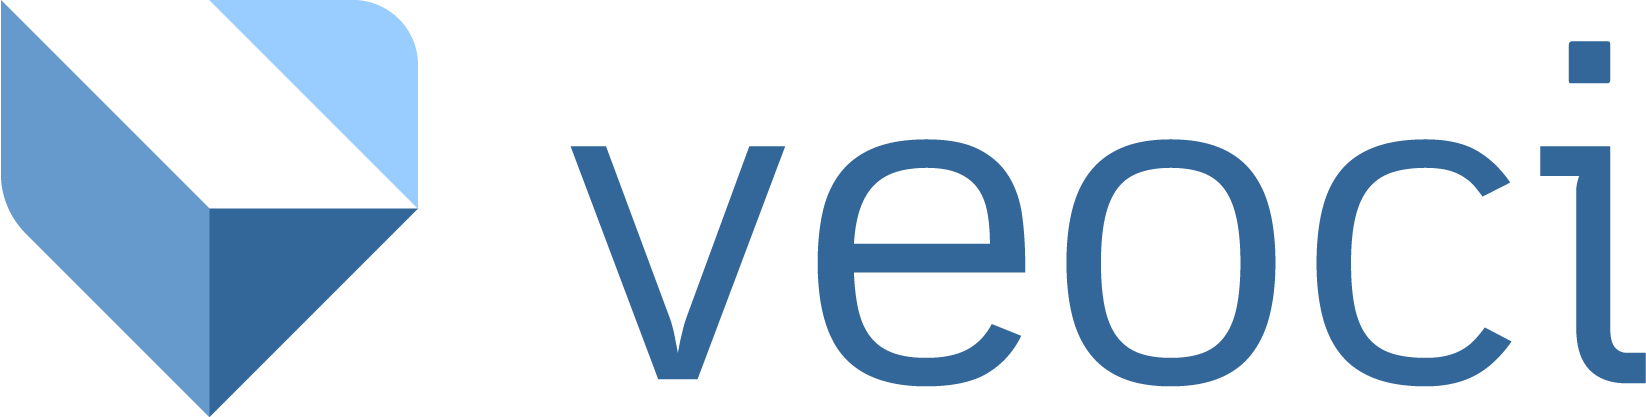 Veoci Named a Gartner Cool Vendor 2015